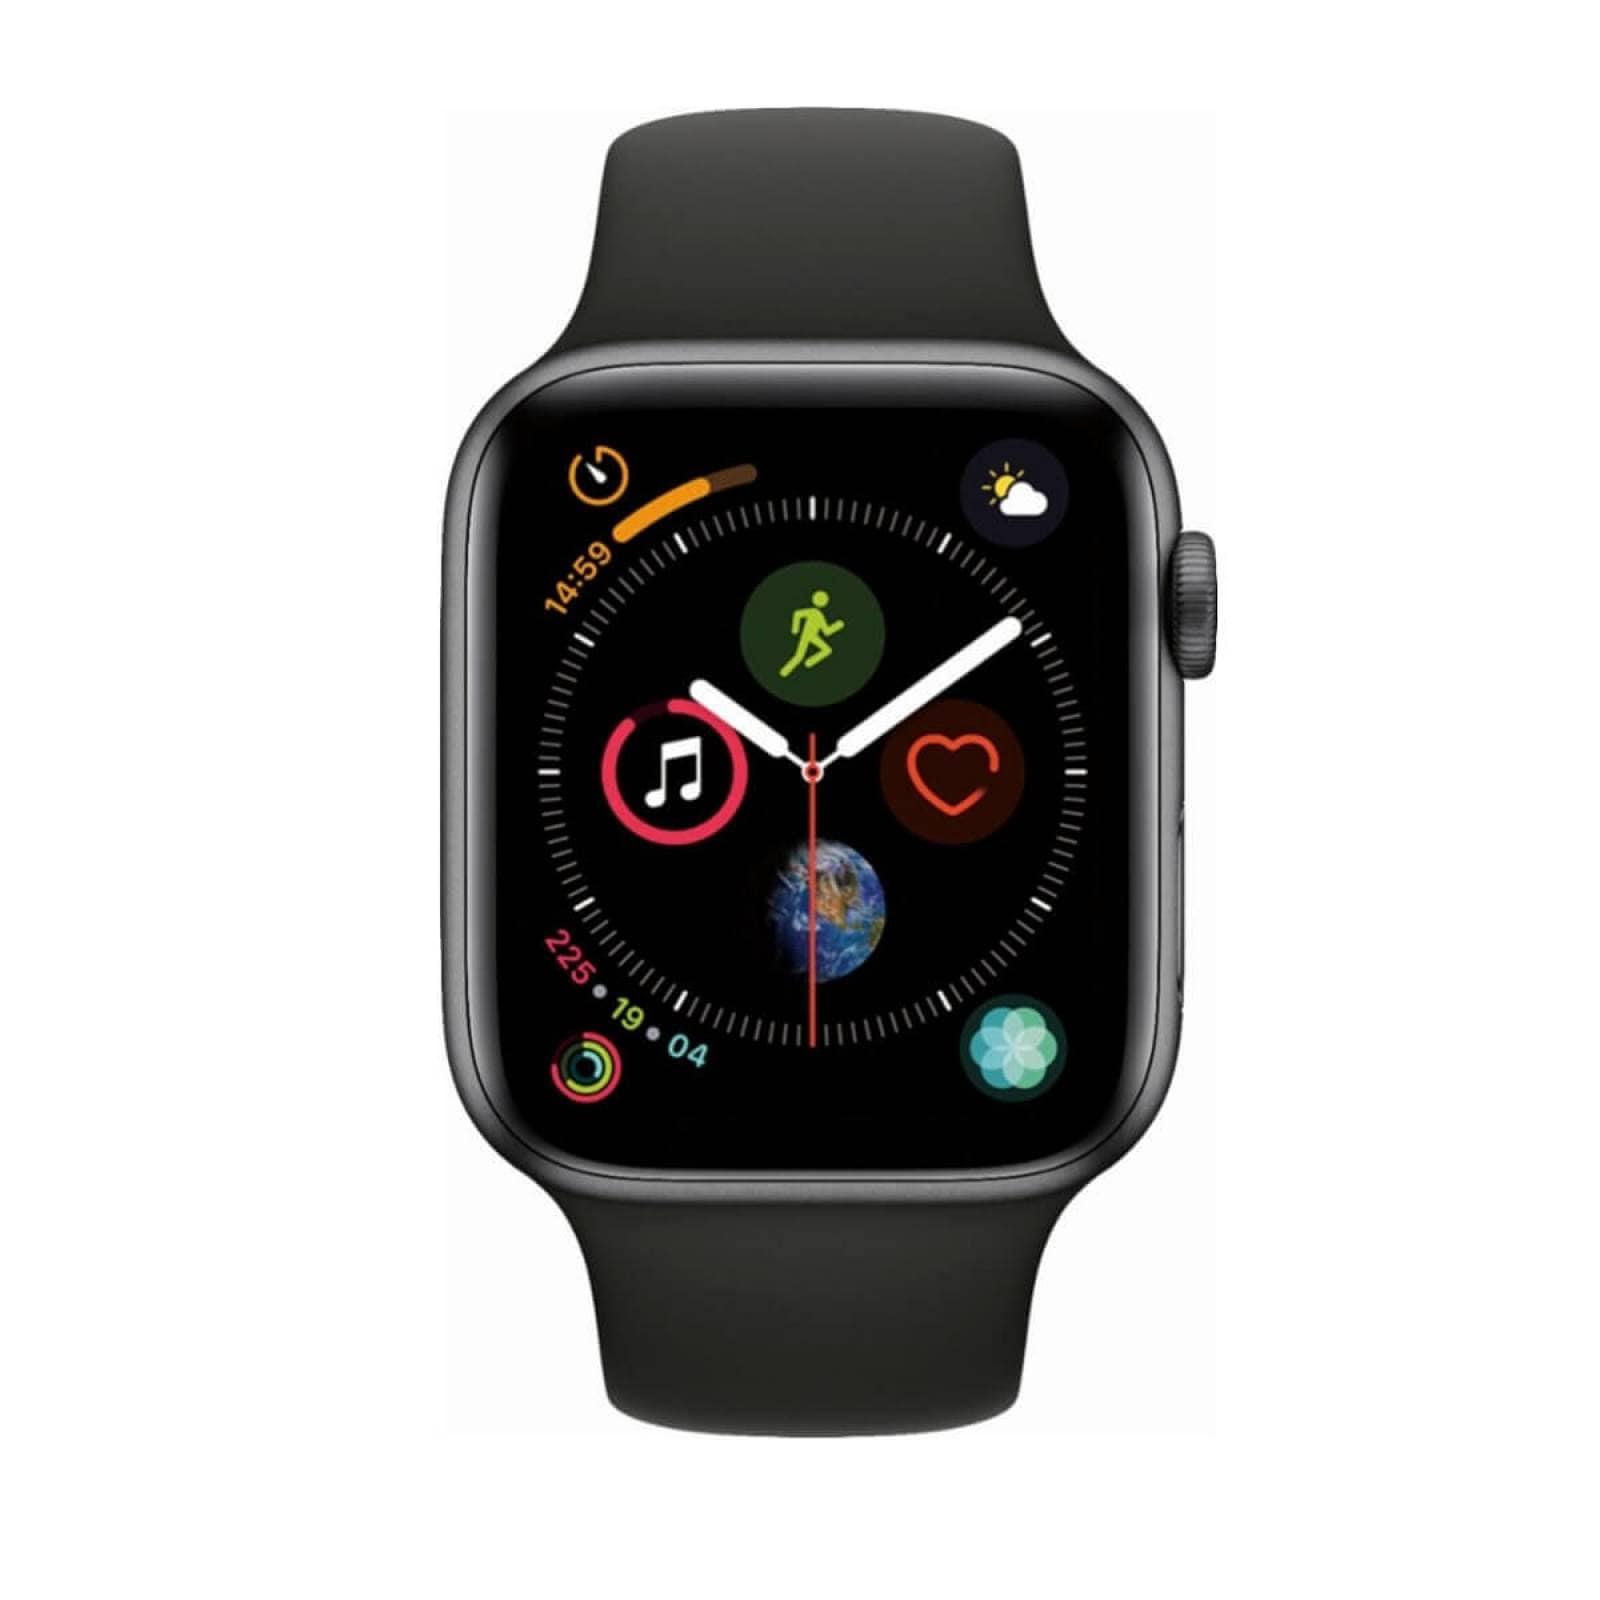 Apple Watch Series 4 Reloj Inteligente 44mm Nuevo Gps Gris oscuro